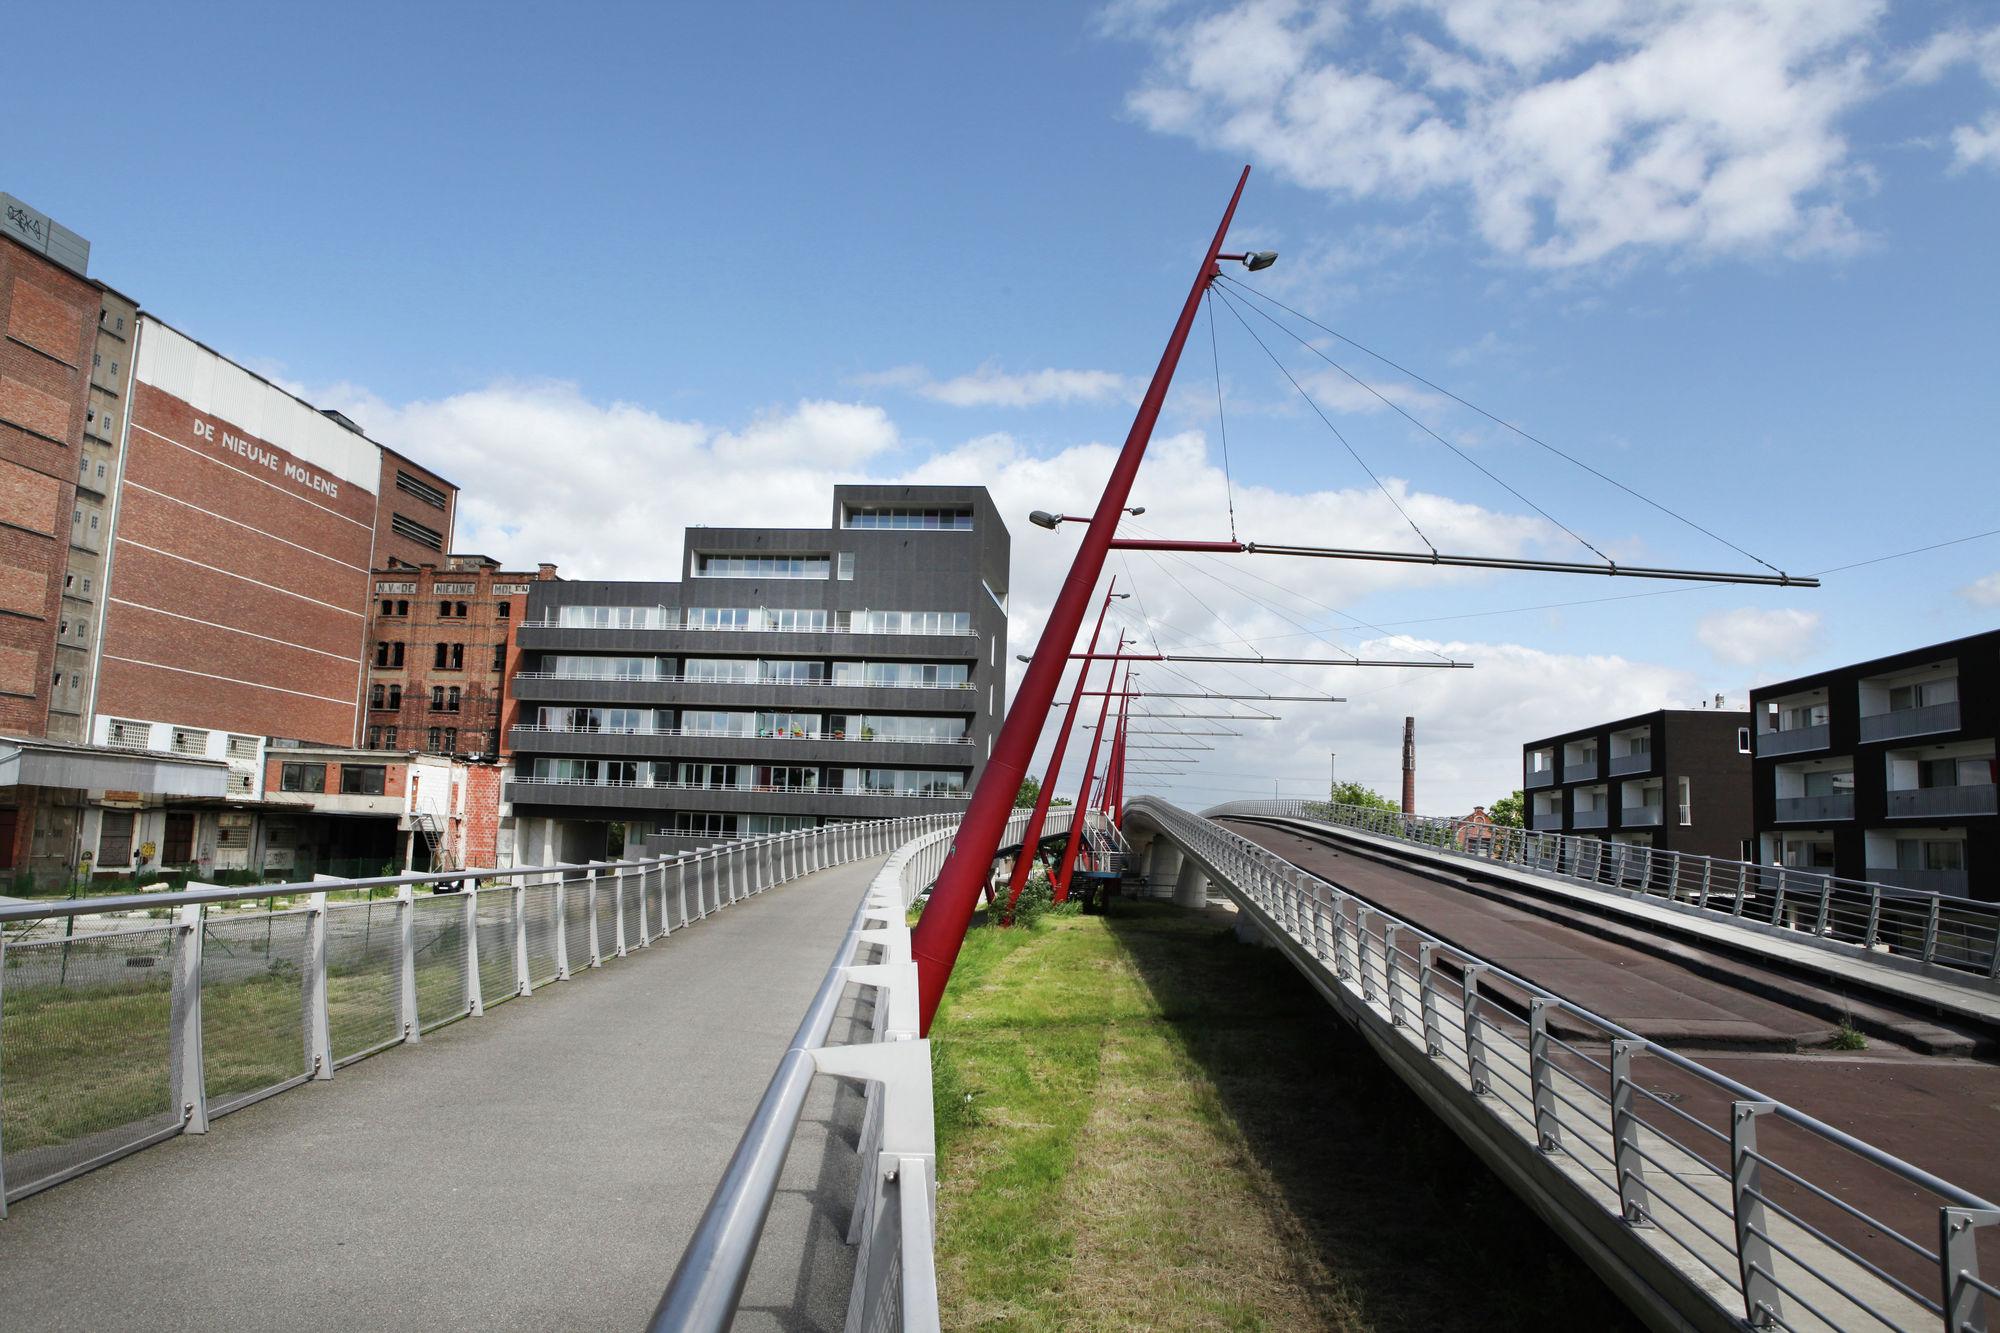 gaardeniersbrug en nieuwe molens (8)©Layla Aerts.jpg